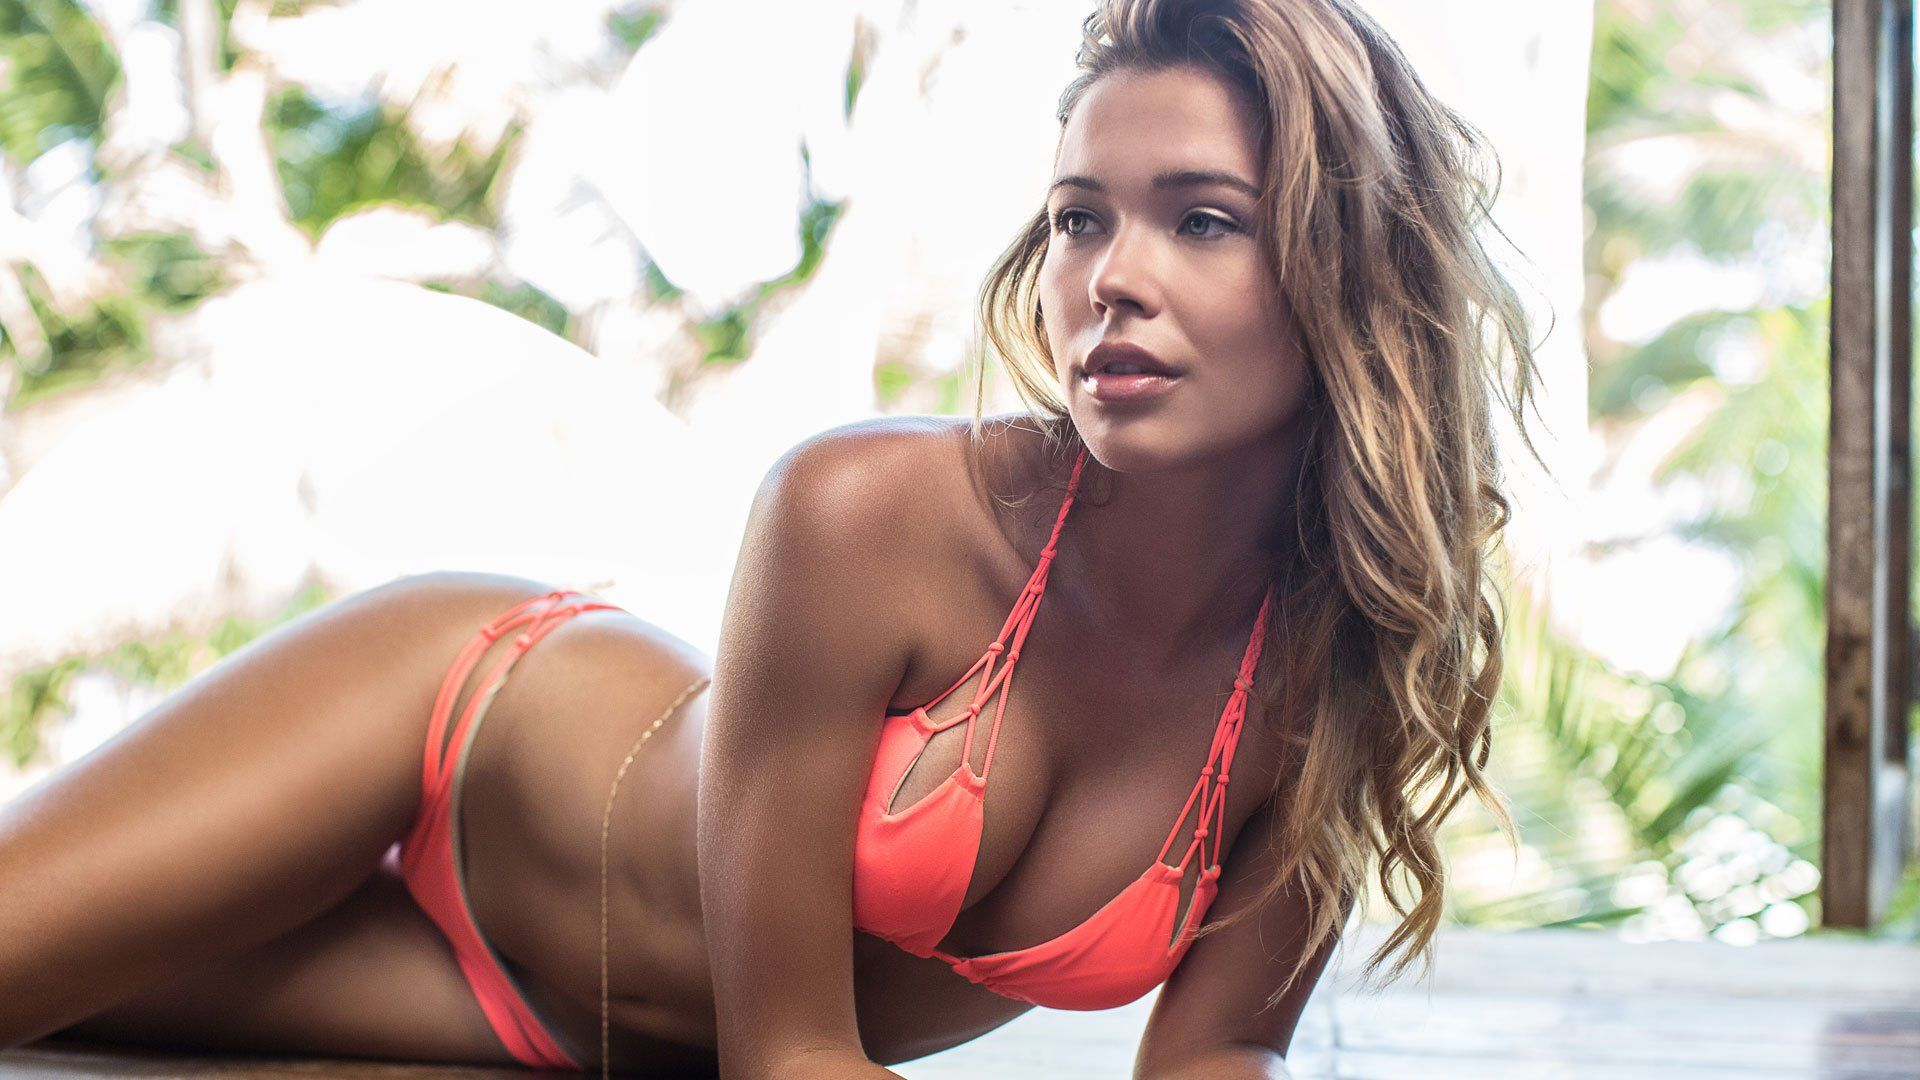 Sandra model nude Nude Bread: Sandra Kubicka in Luli Fama Bikini Photoshoot